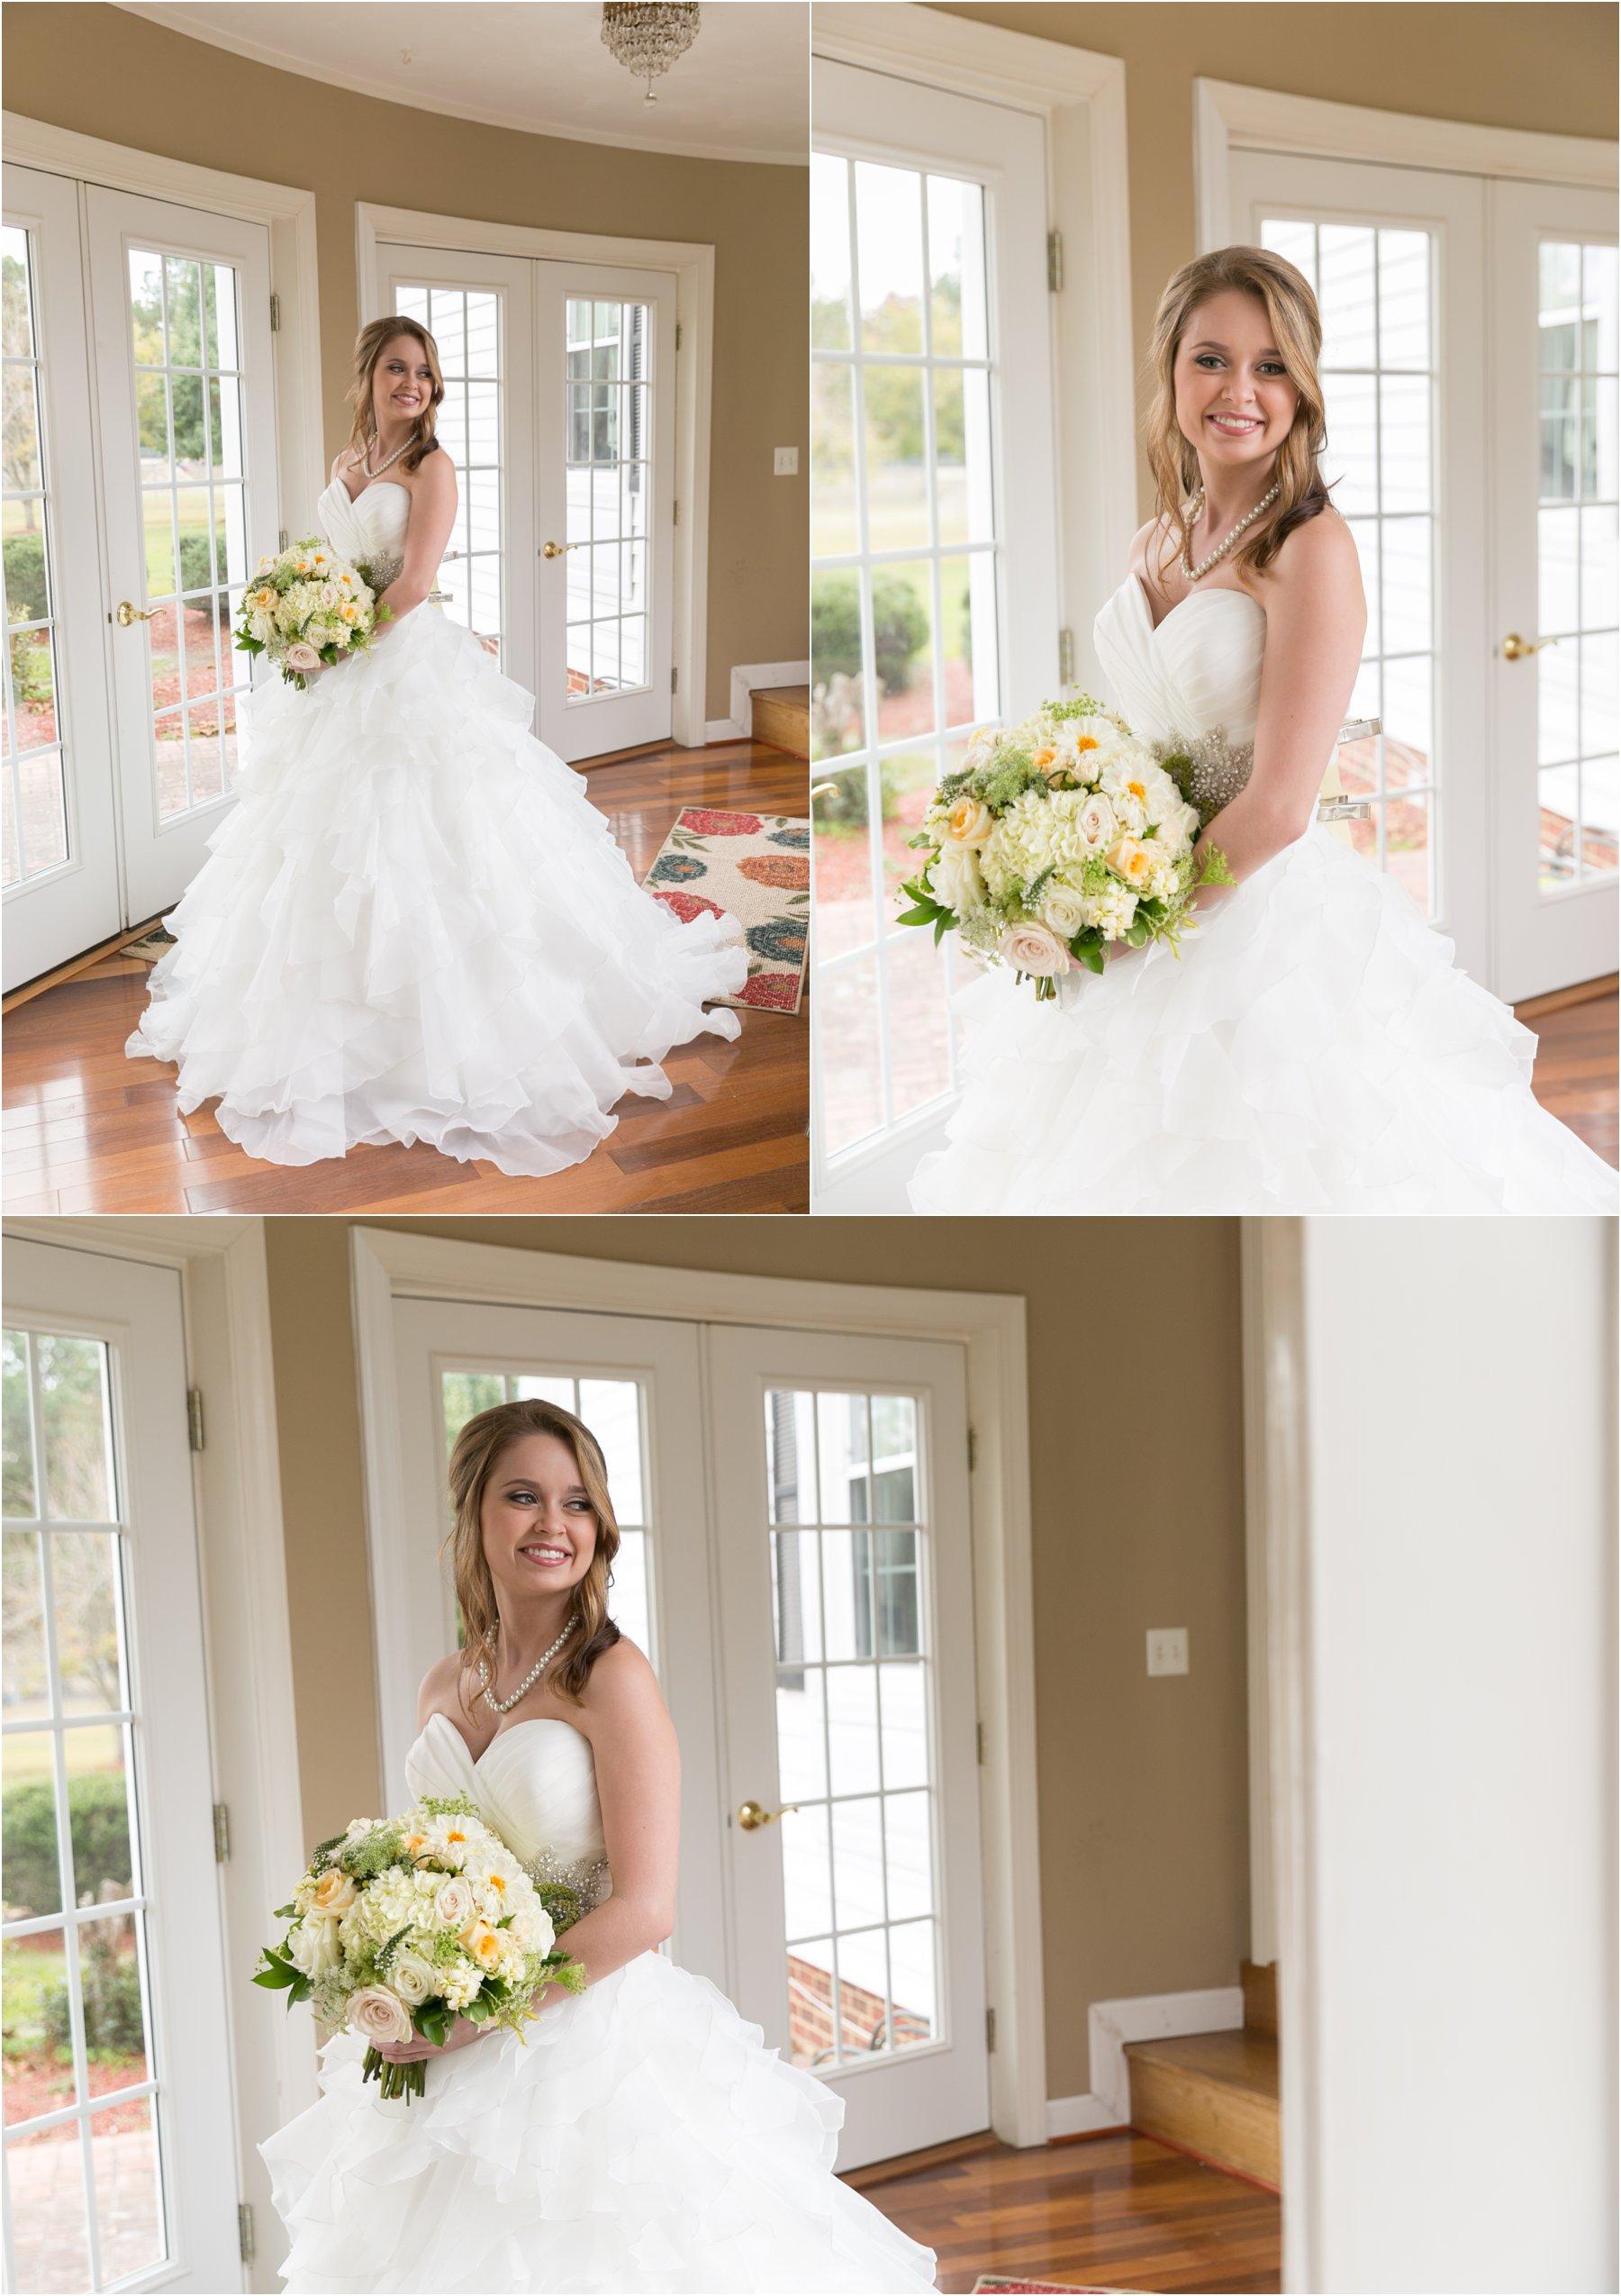 Holly_Ridge_Manor_Wedding_Photography_Jessica_Ryan_Photography_virginia_virginia_beach_0248